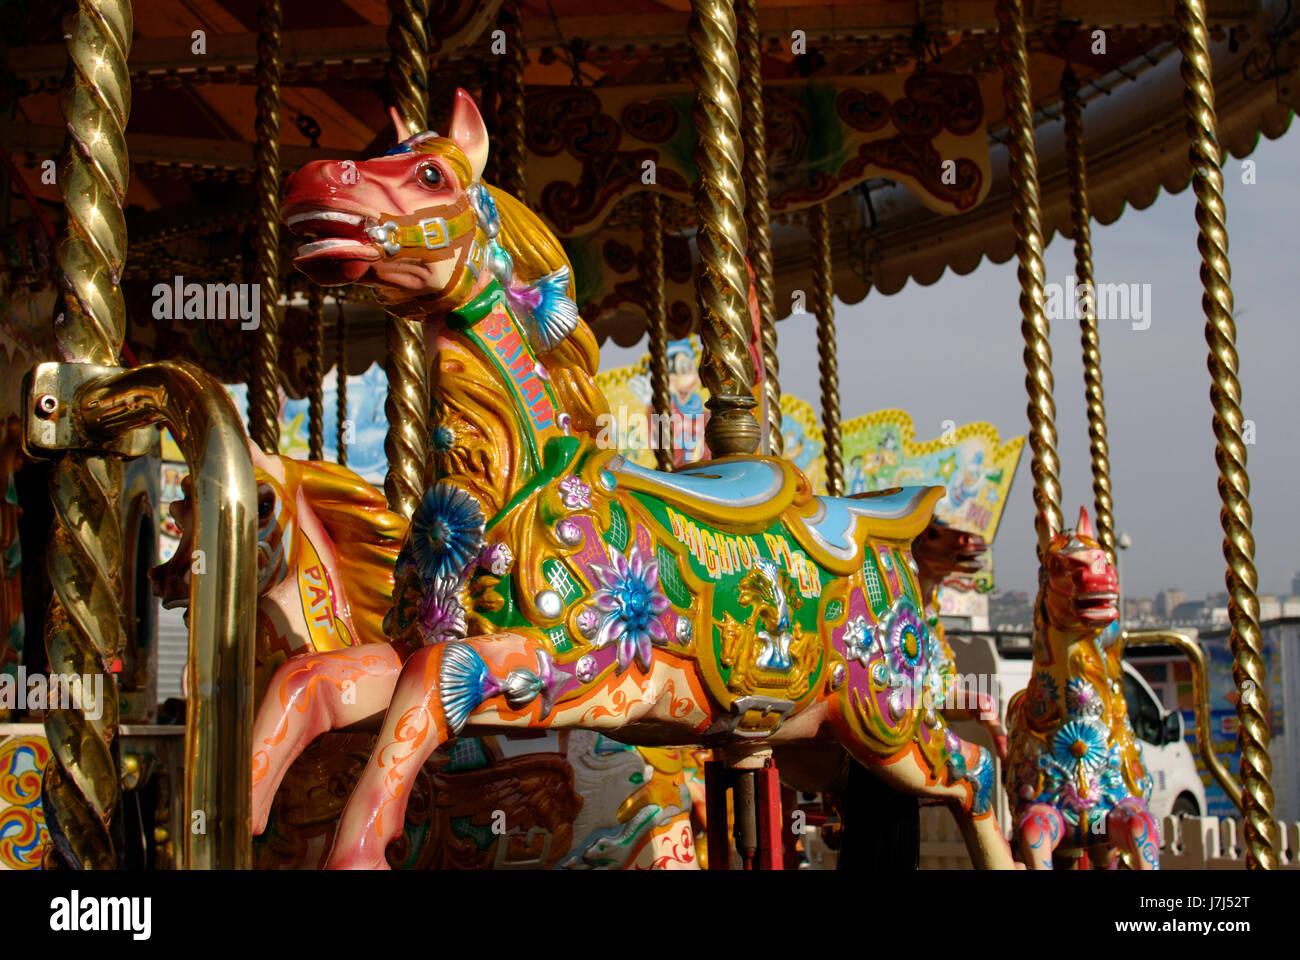 ride horse england fairground carousel roundabout entertainment ...